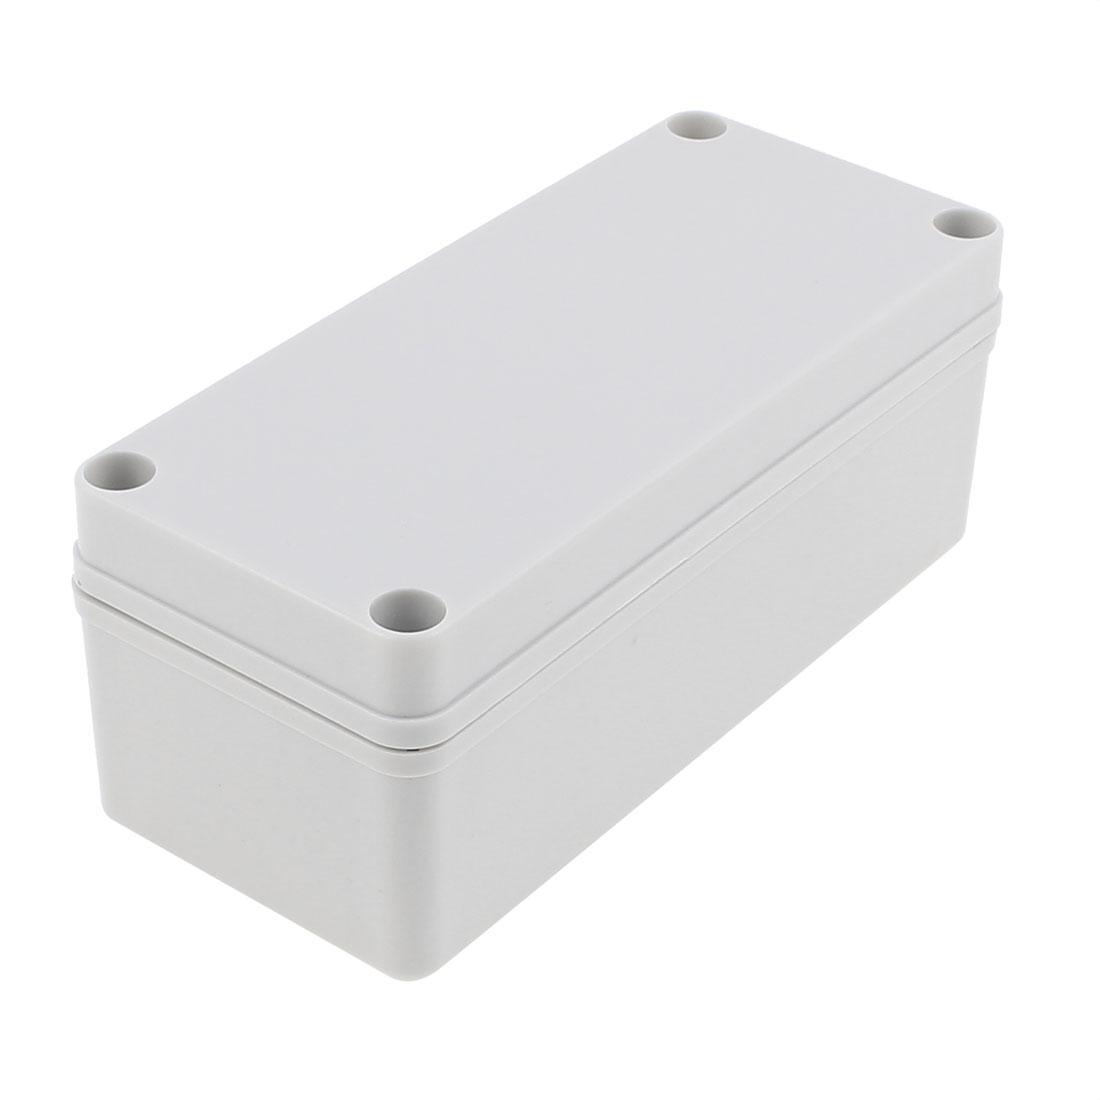 180 x 80 x 70mm Dustproof IP65 Junction Box Terminal Connecting Box Enclosure